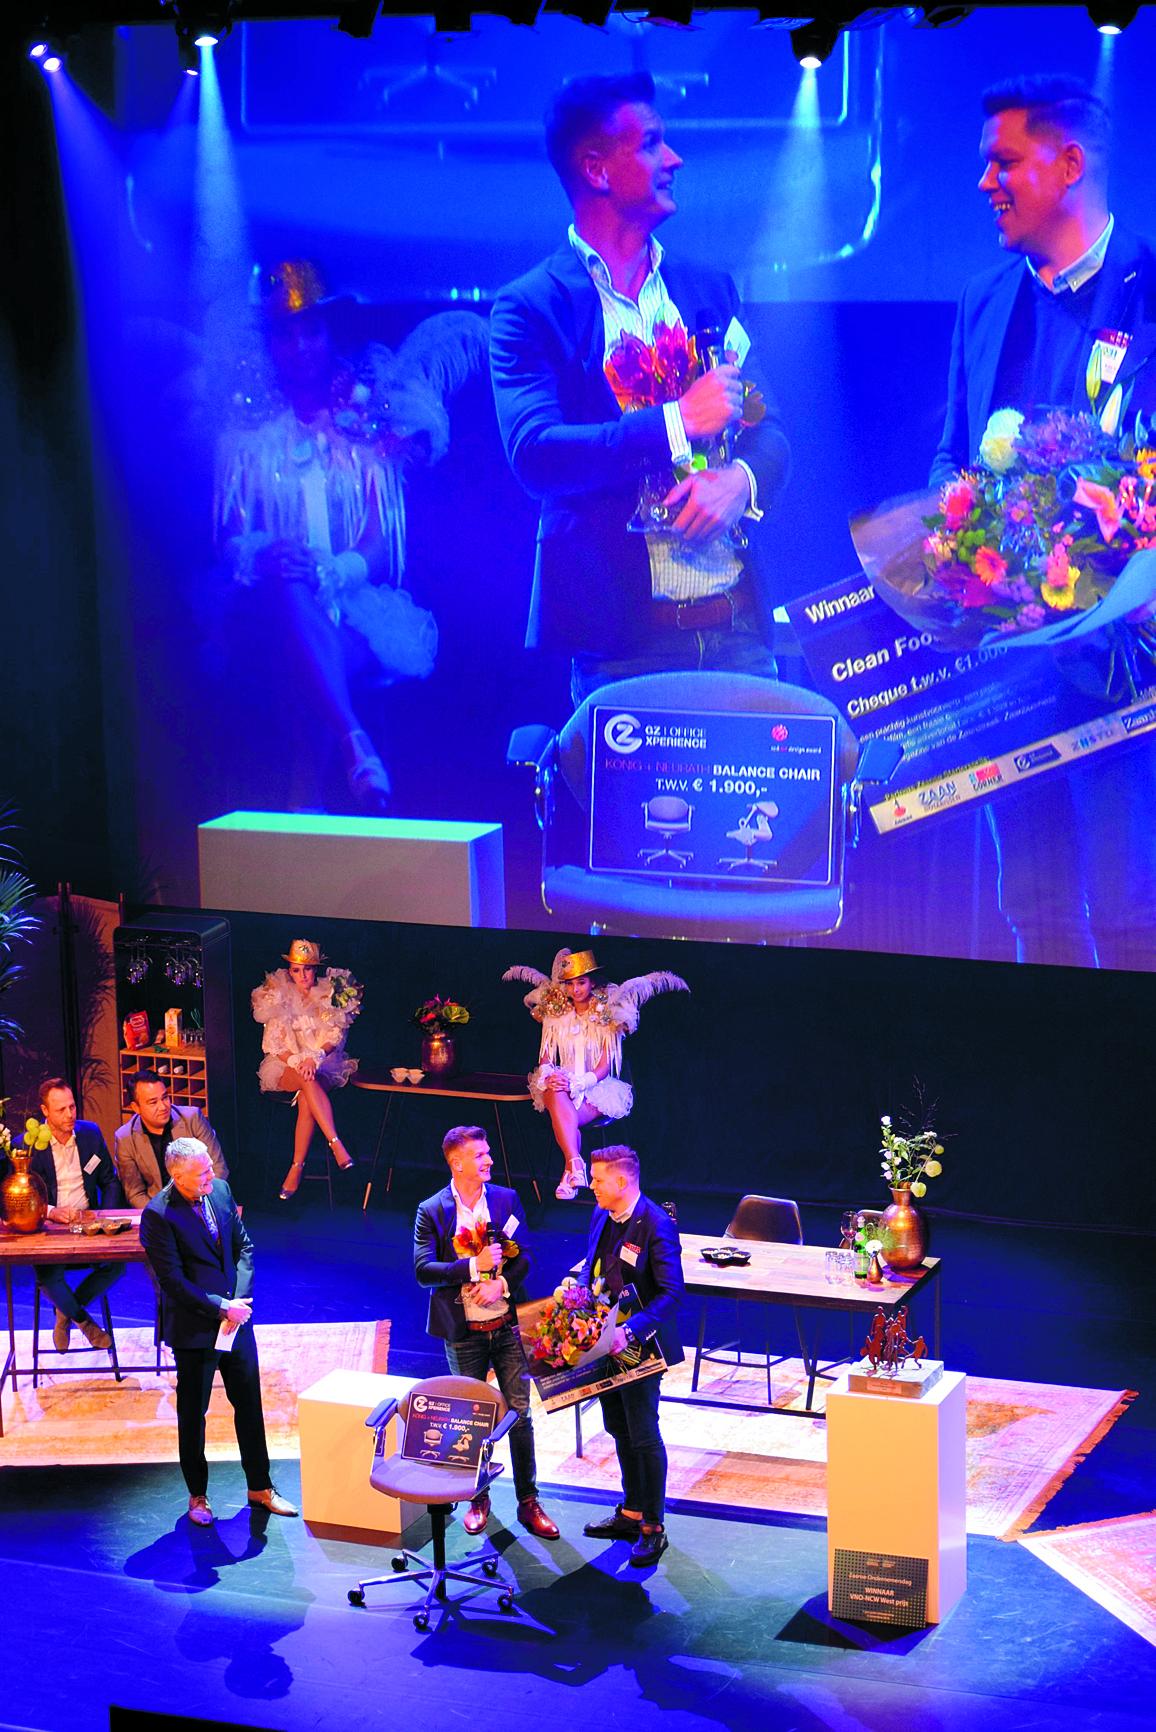 Winnaars Directeur Mandy Beets (met microfoon) en manager tussen de feestslingers. (Foto: YvdD/RM)    rodi.nl © rodi